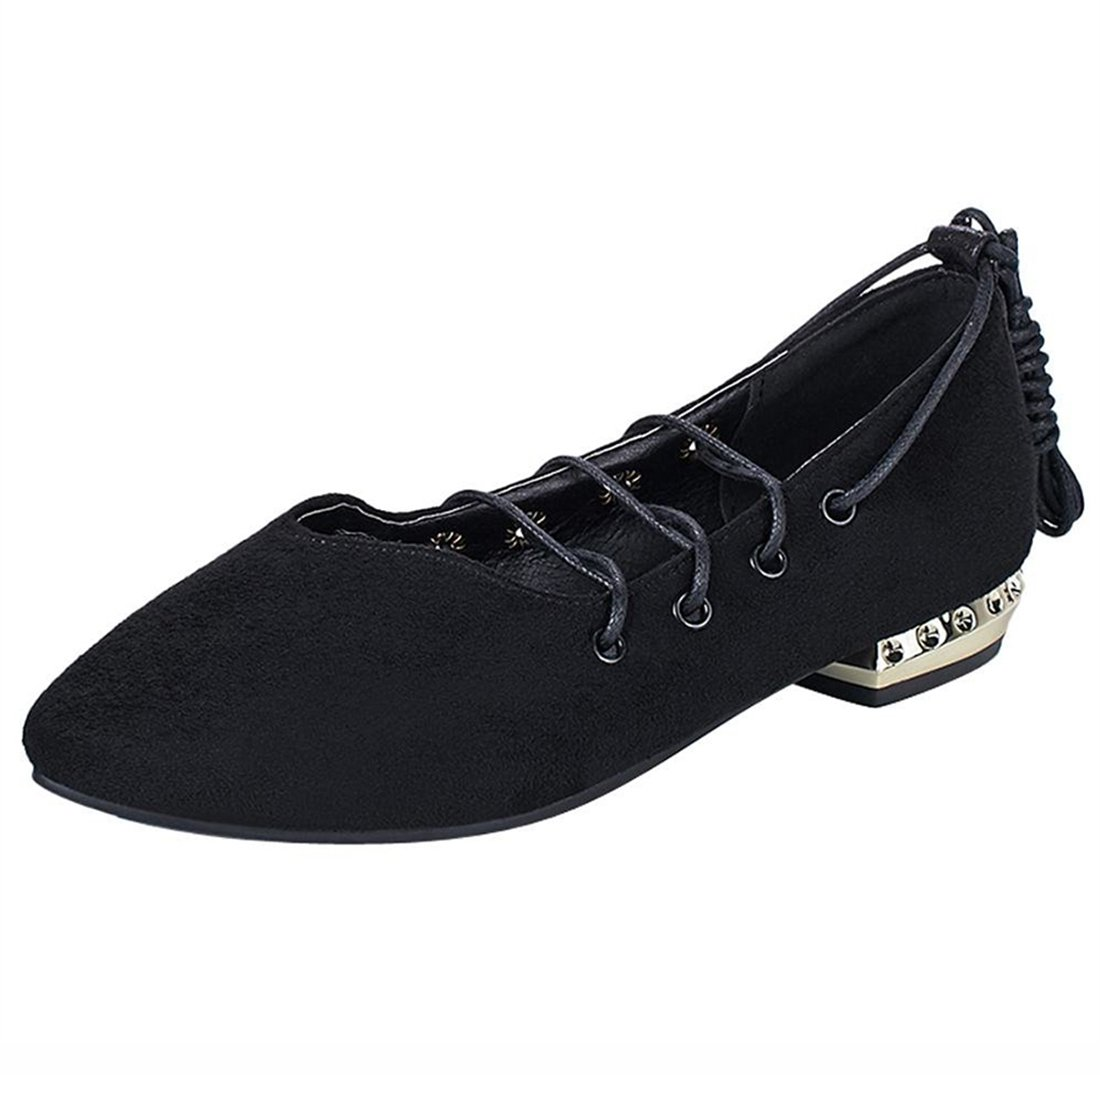 UH Damen Glitzer Flache Halbschuhe mit Schnuuml;rung Spitze Slipper Pailletten Bequeme Schuhe36 EU|Schwarz